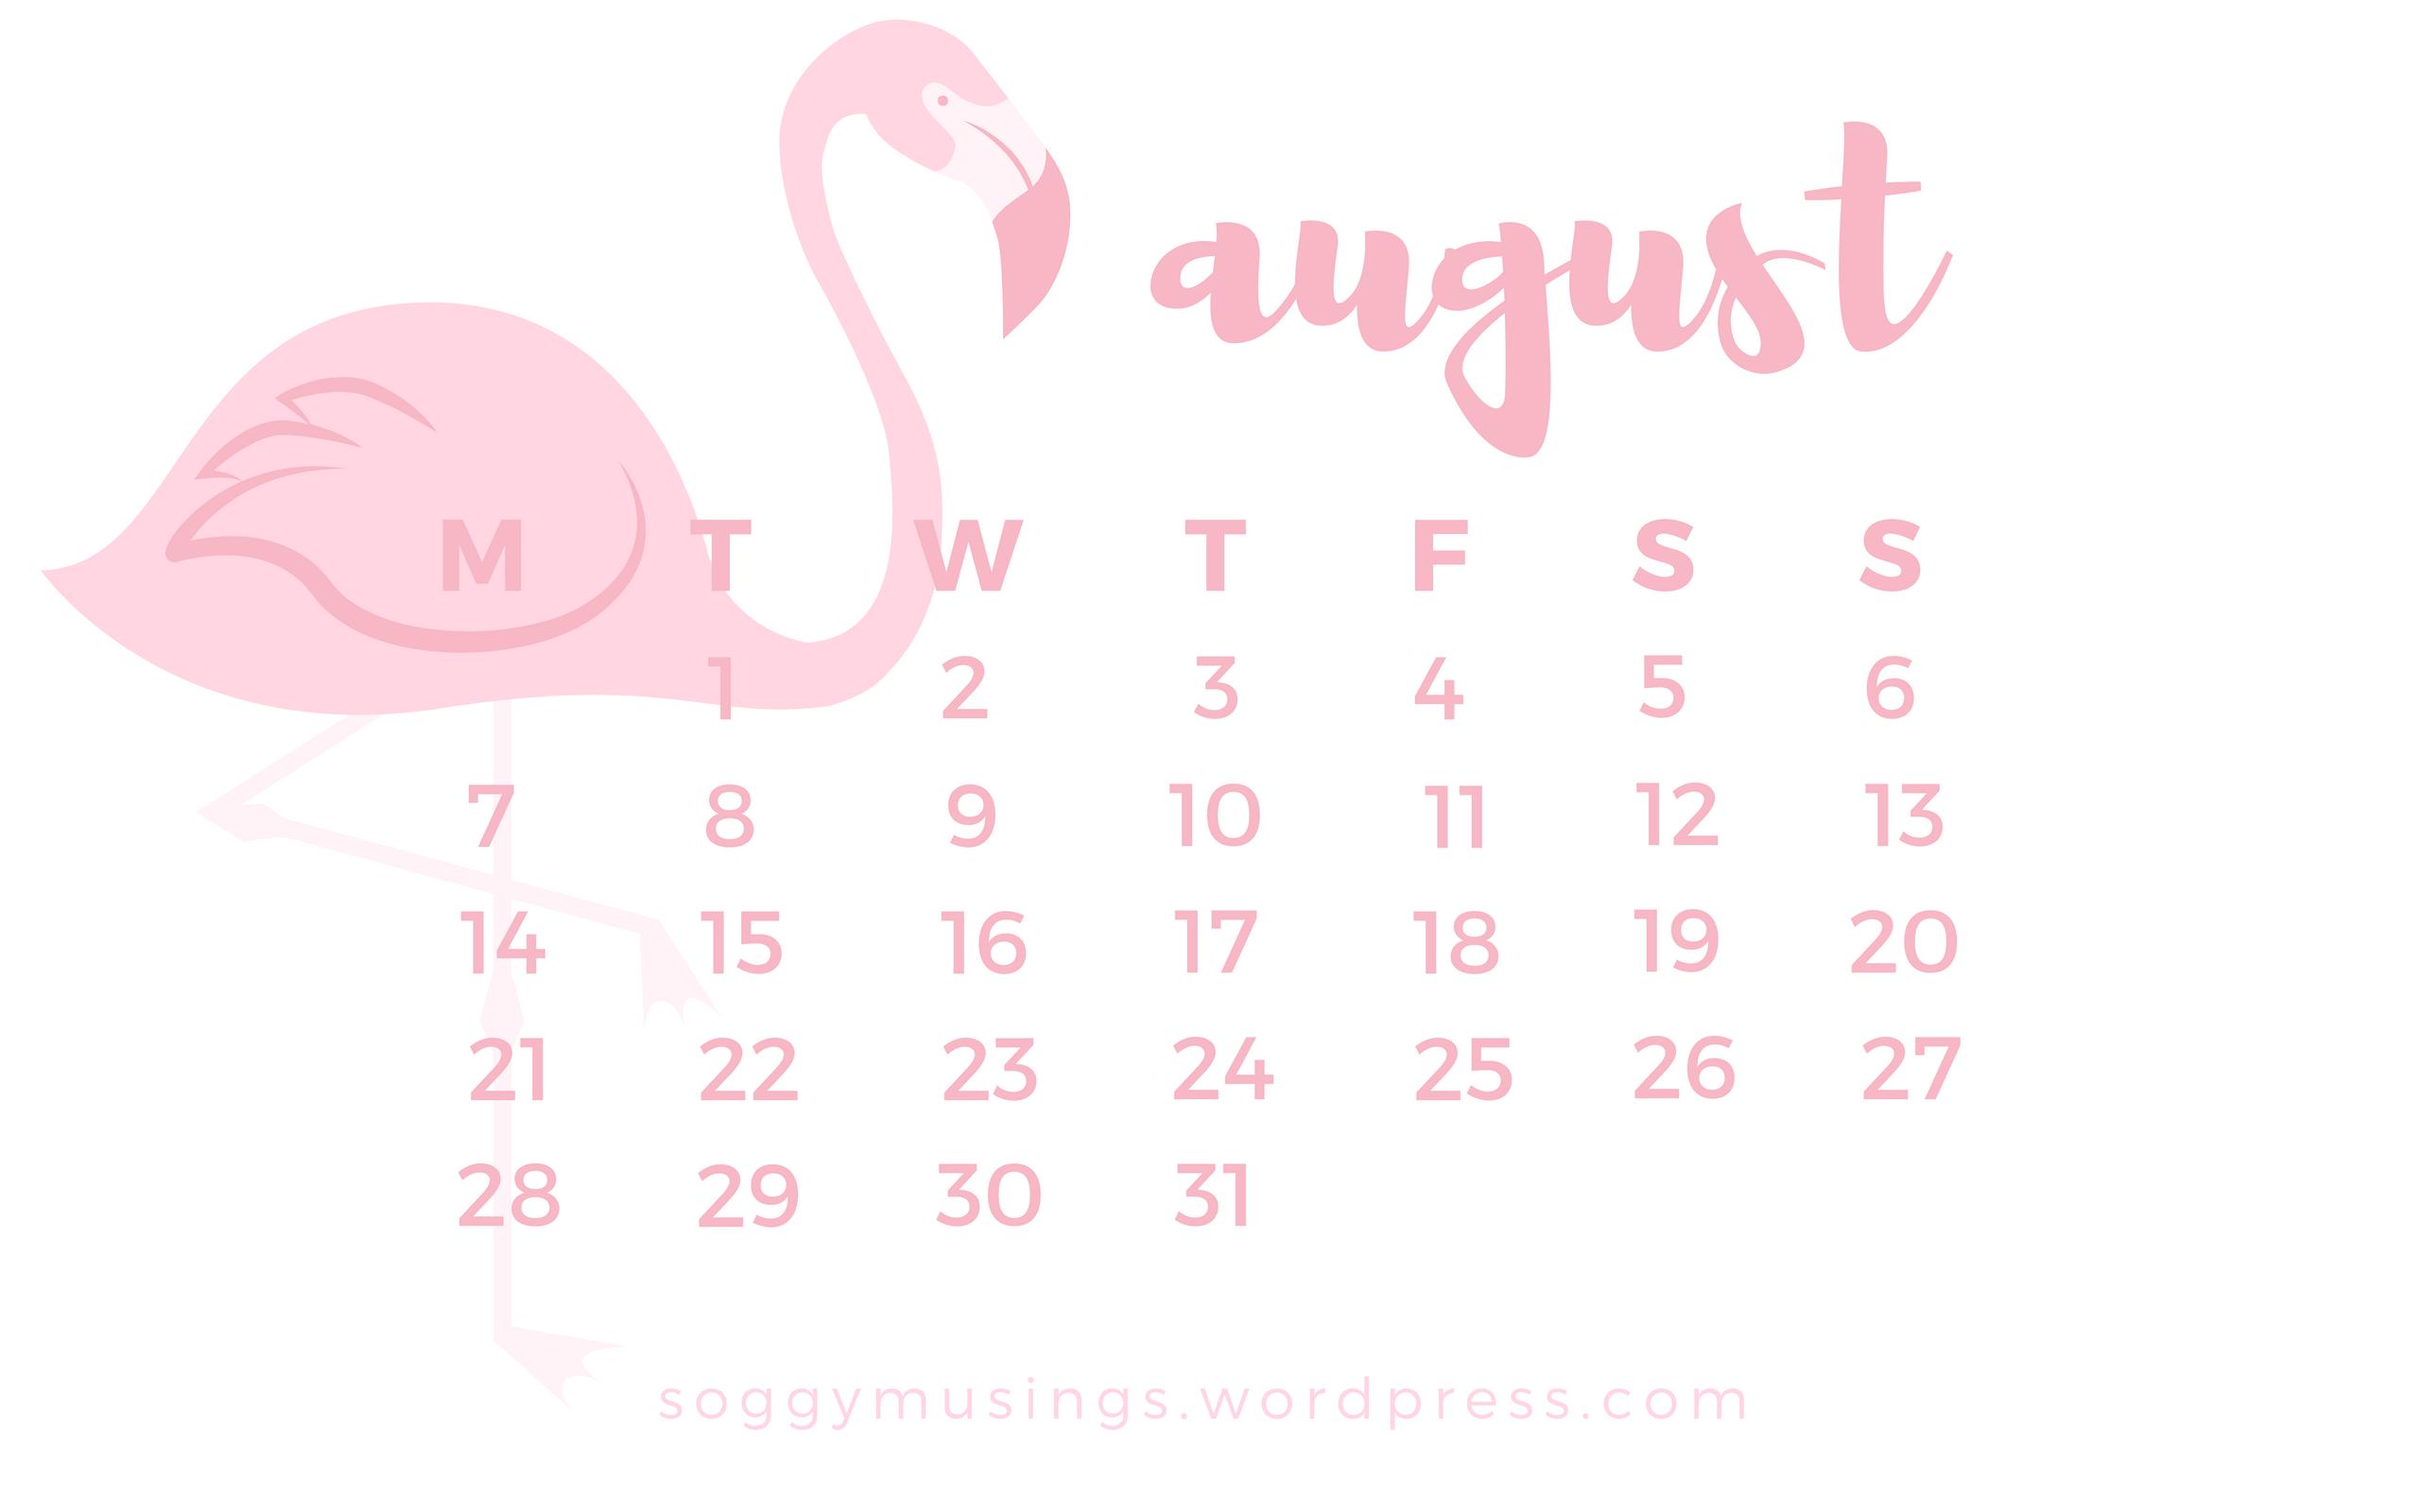 august 2017 wallpaper for desktop download for desktop